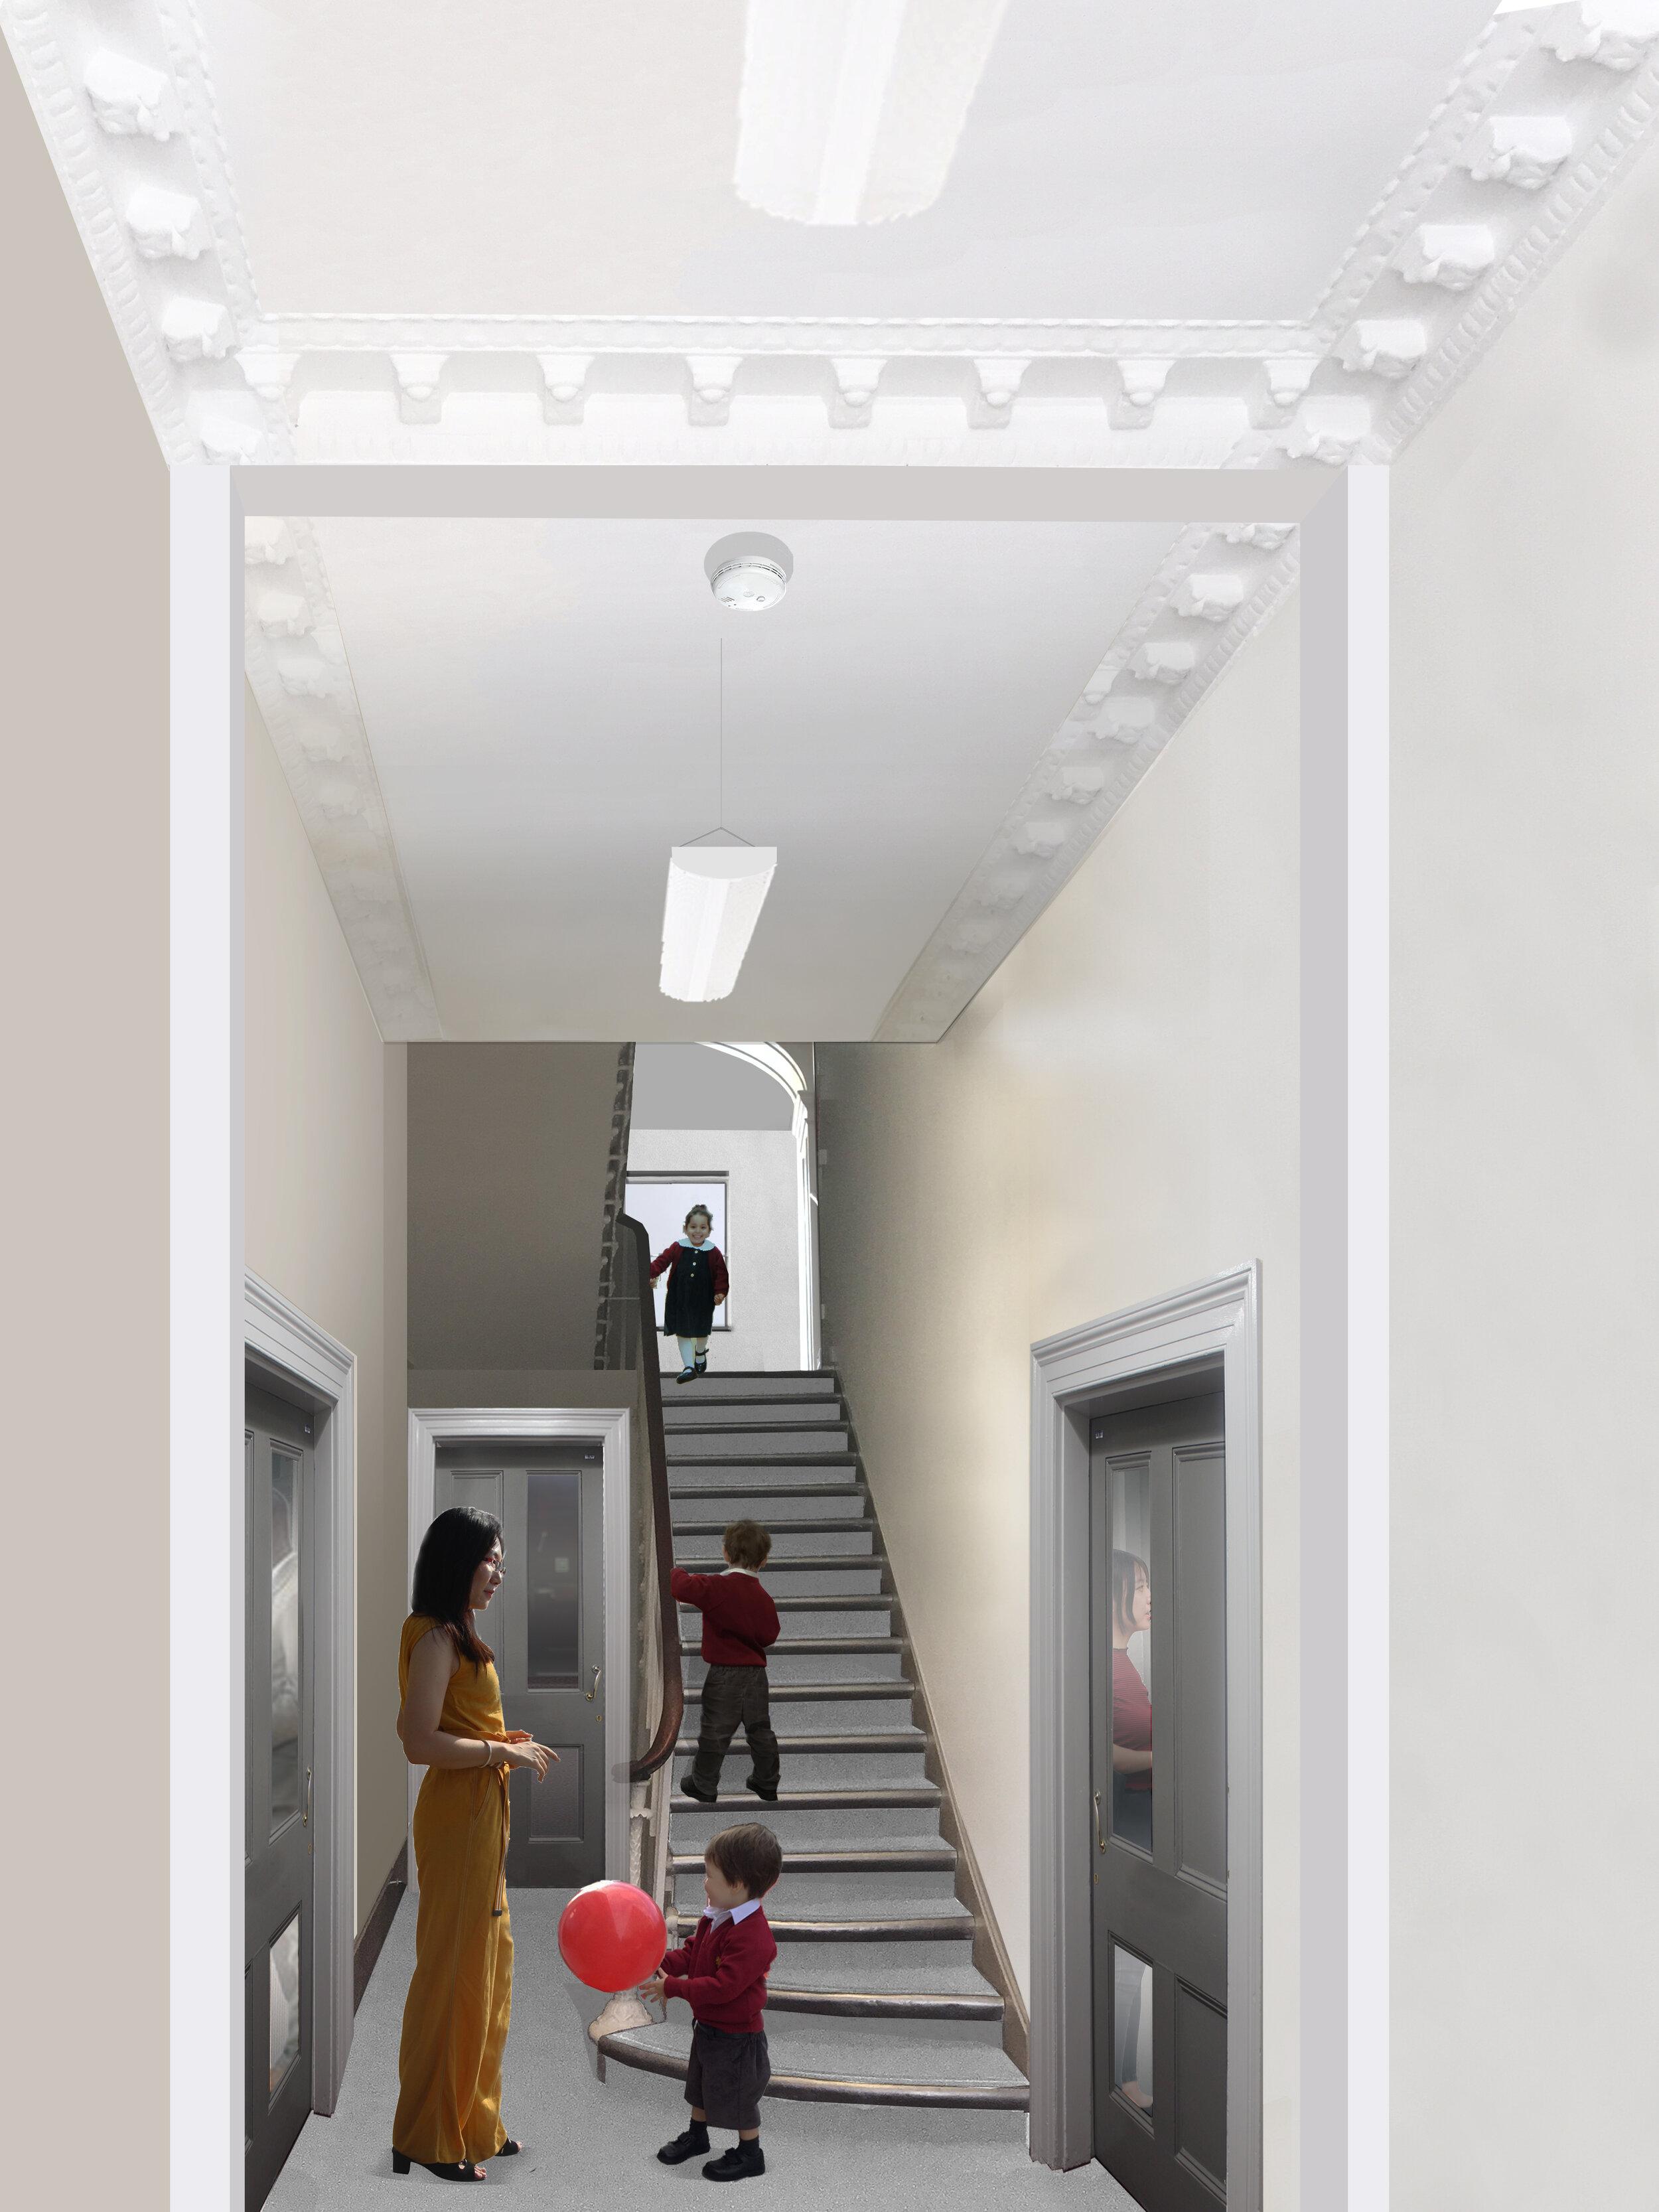 17015_Proposed ground floor hallway view_ DRAFT 27 08 19.jpg